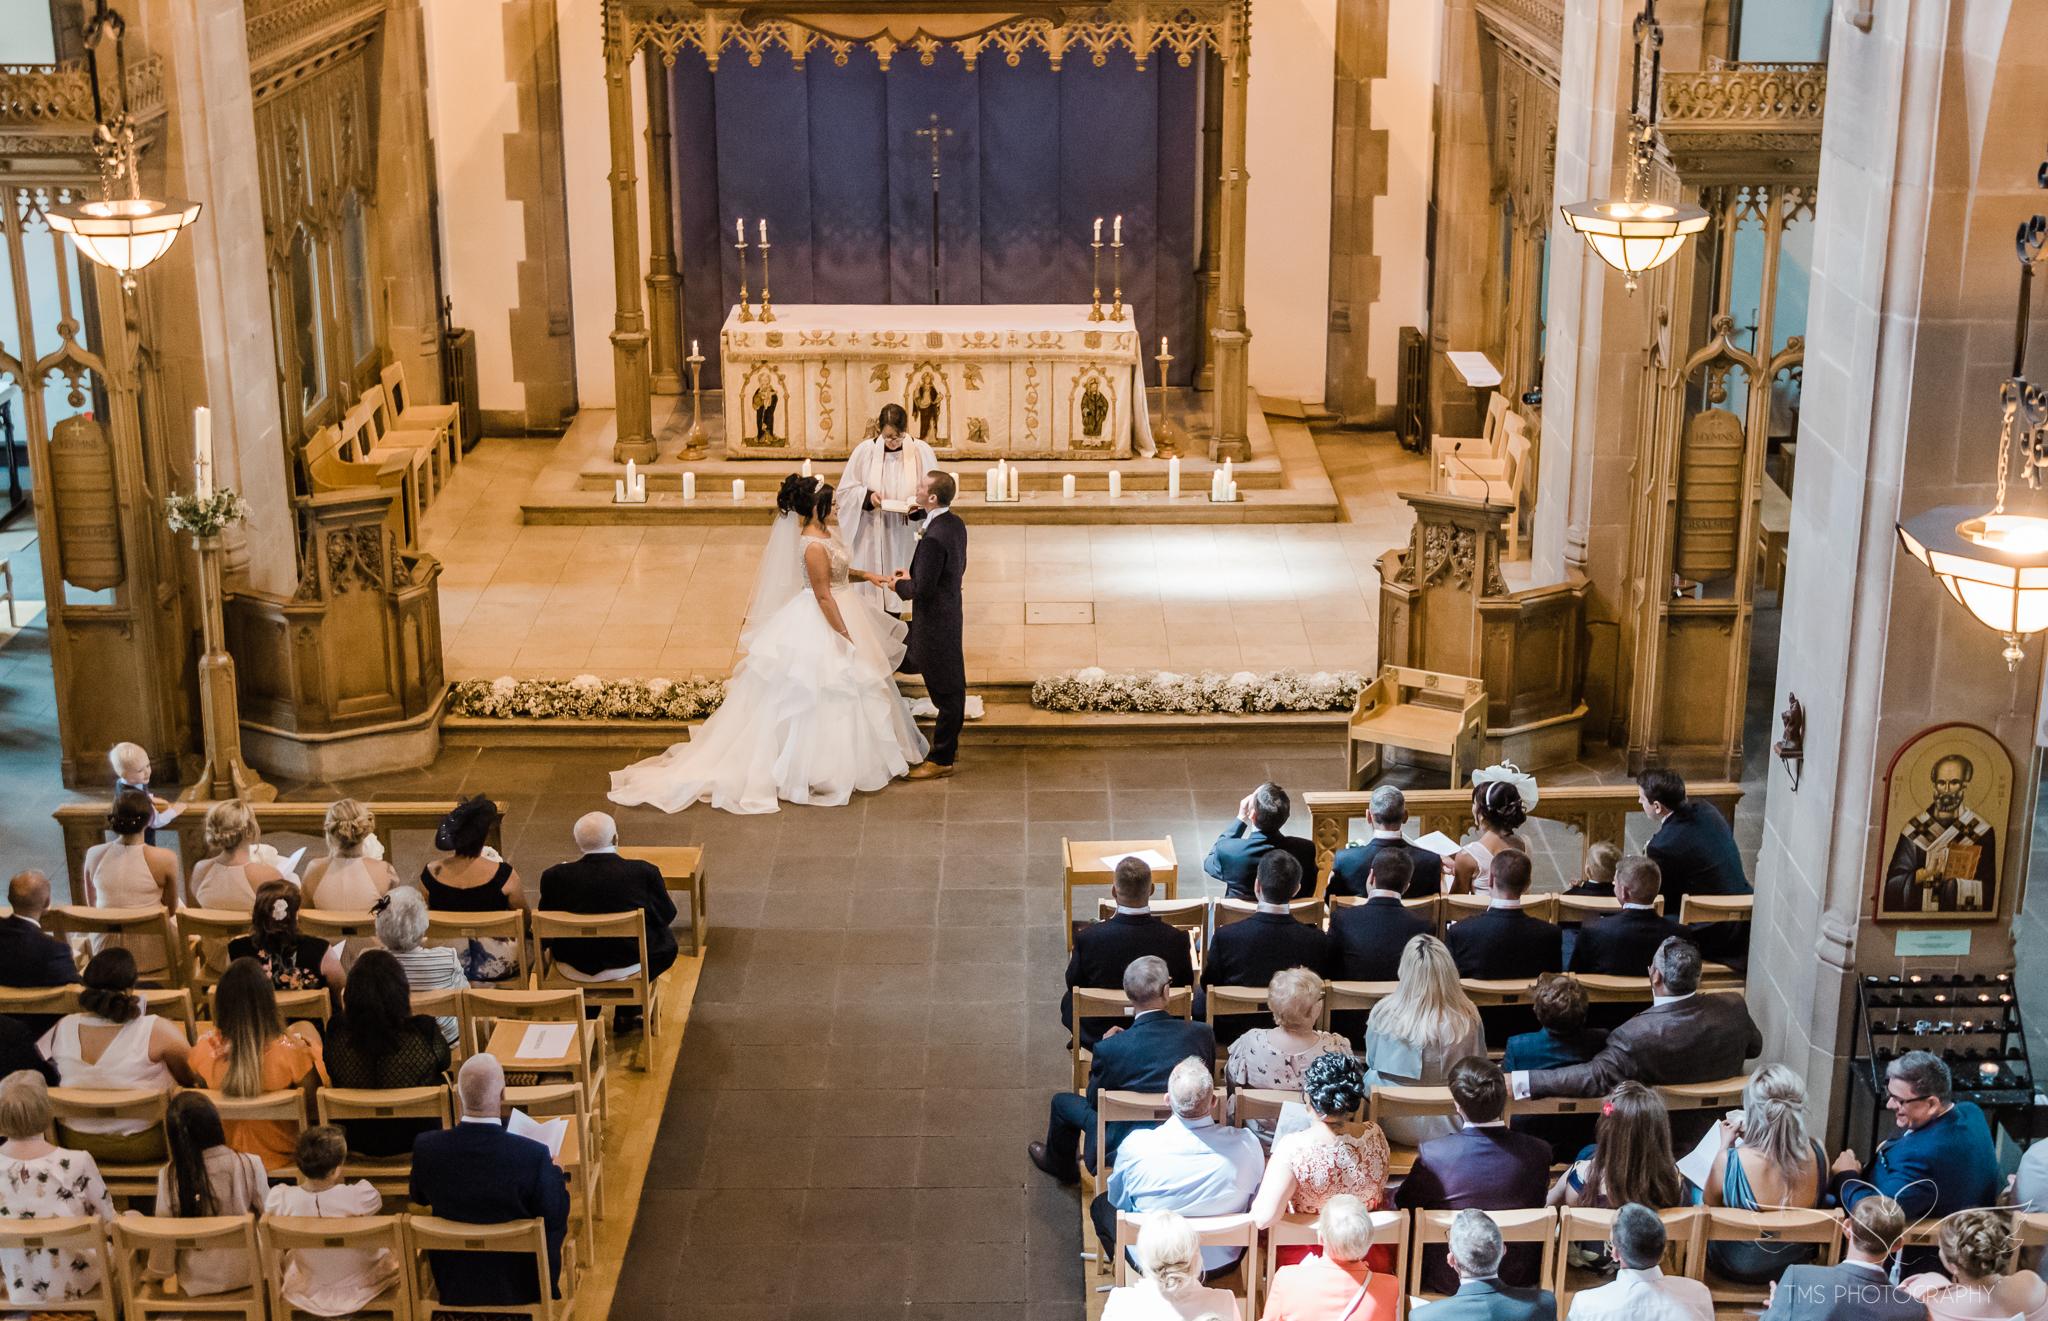 Wedding_photography_Hilton_liverpool_Albertdocks-79